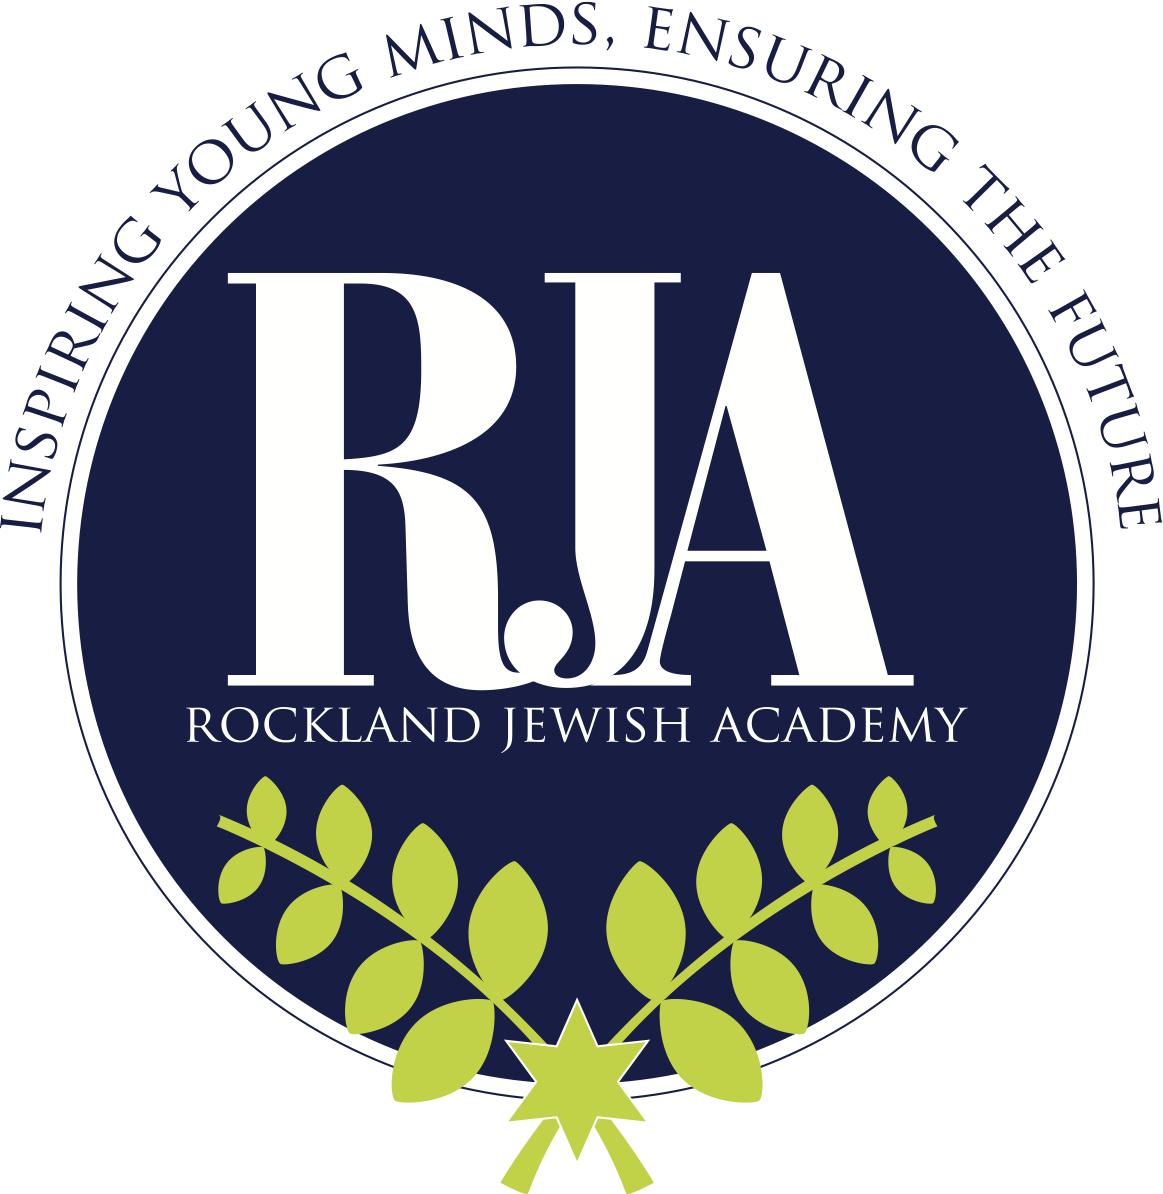 Jewish Day School. Rockland